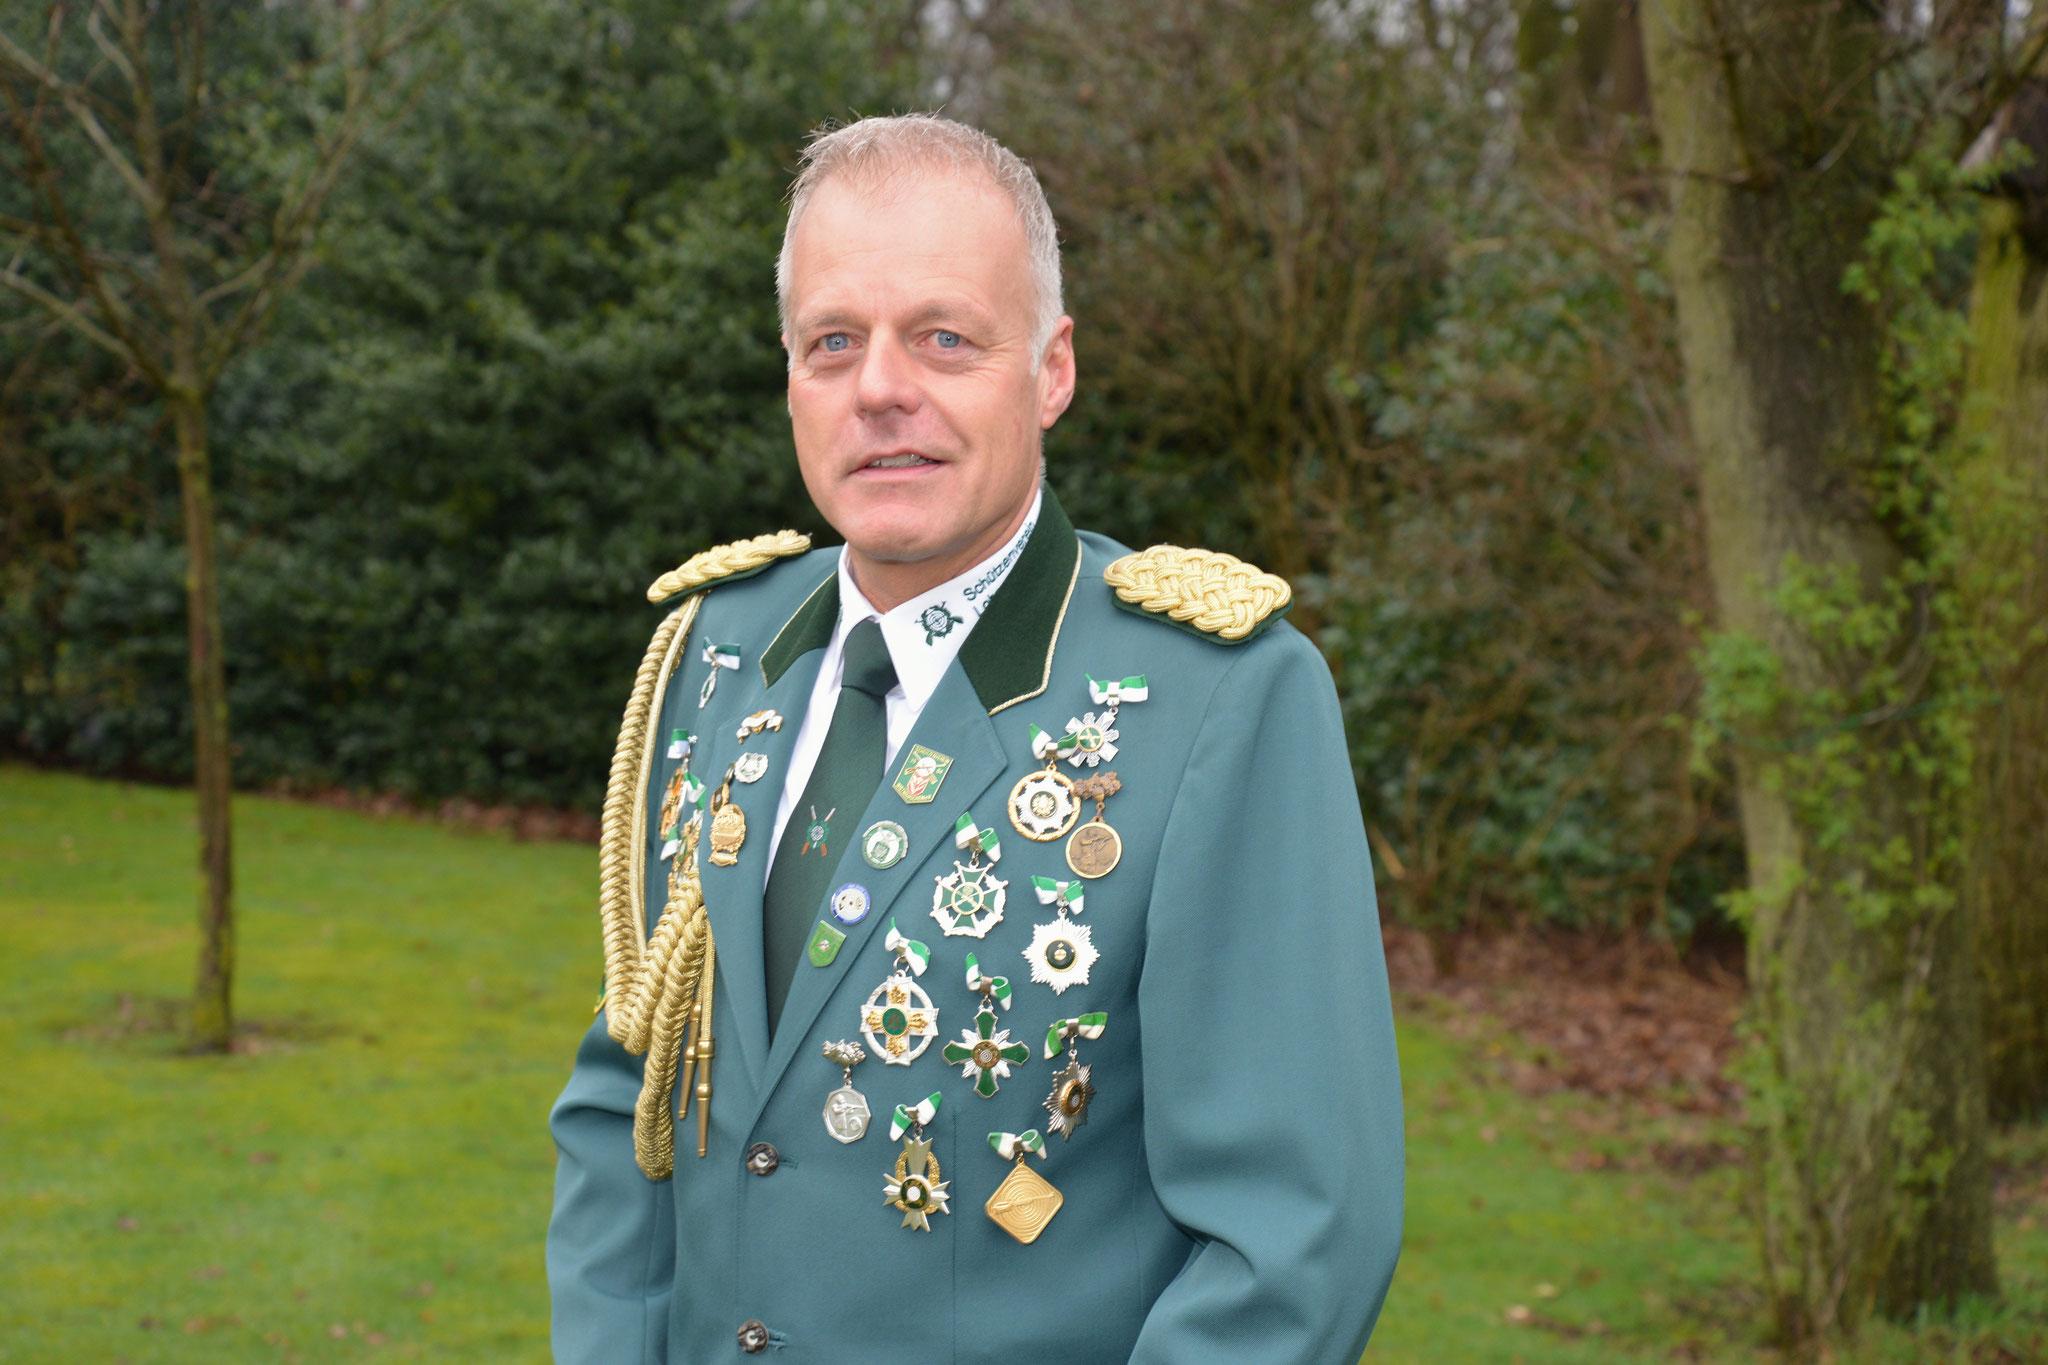 Hubert Overberg